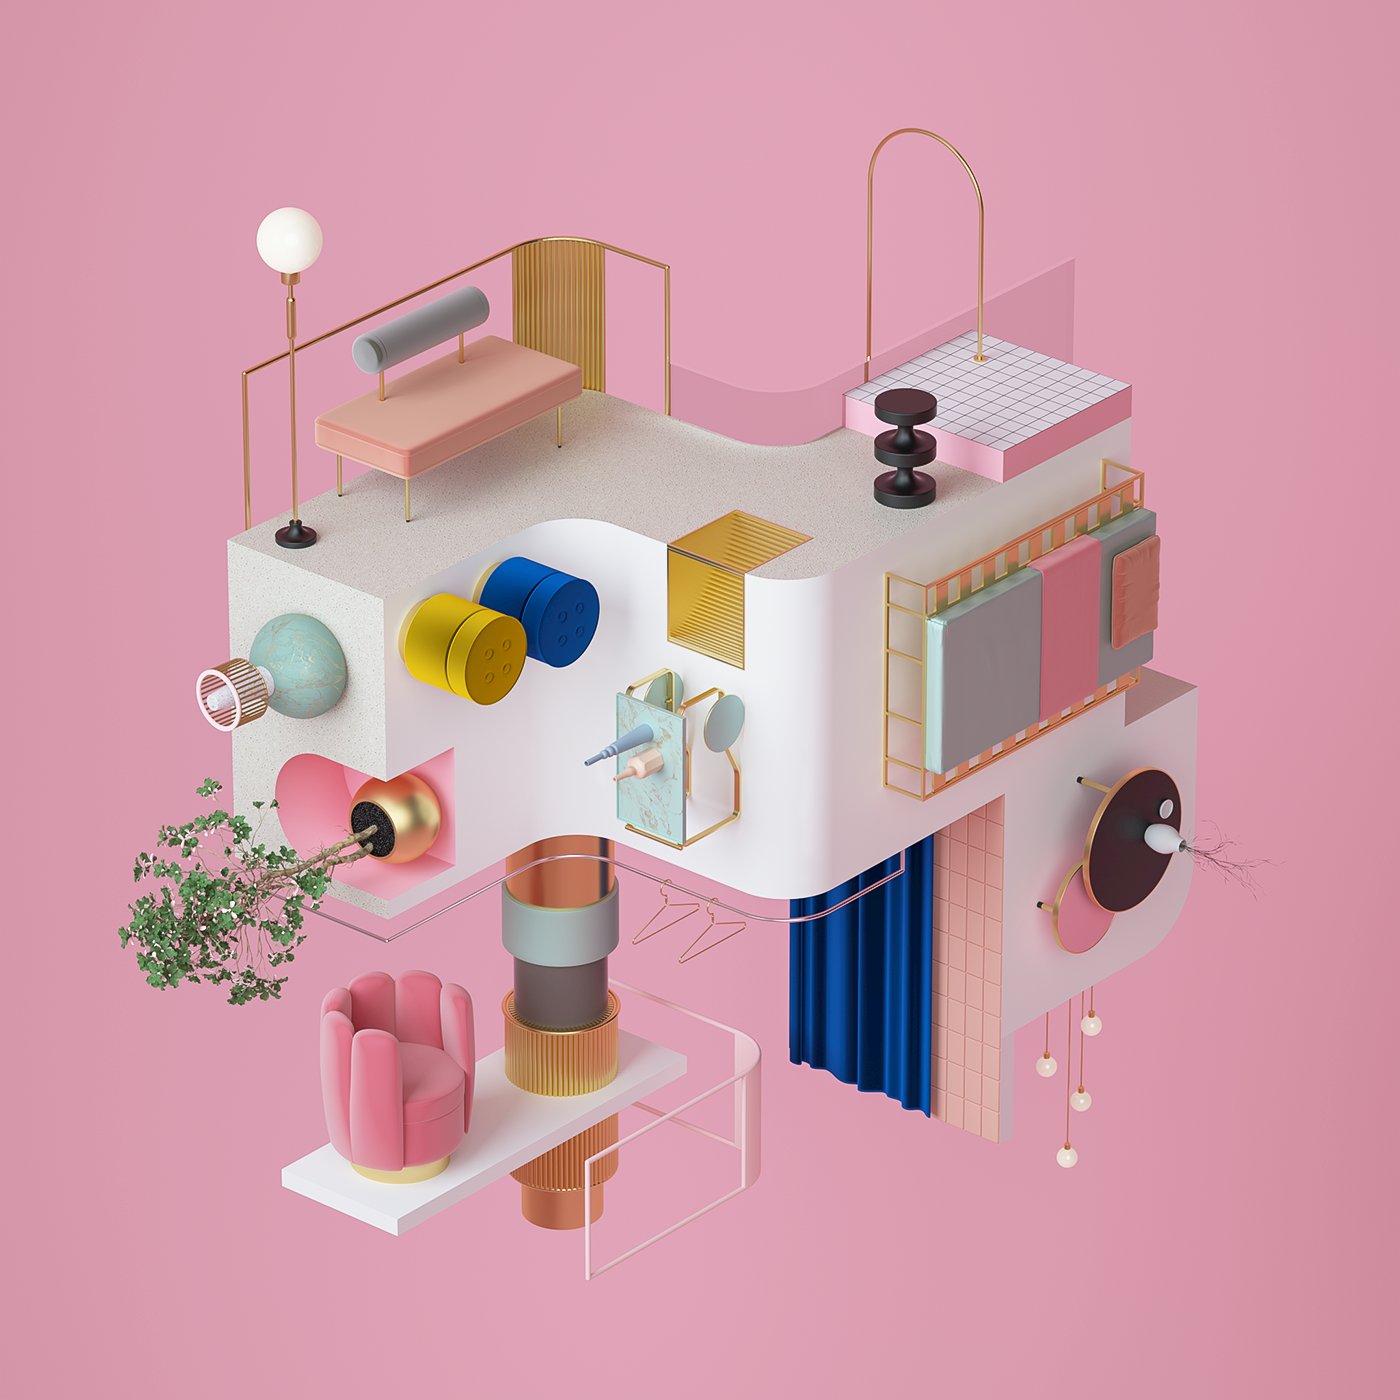 2018 Design Trends on